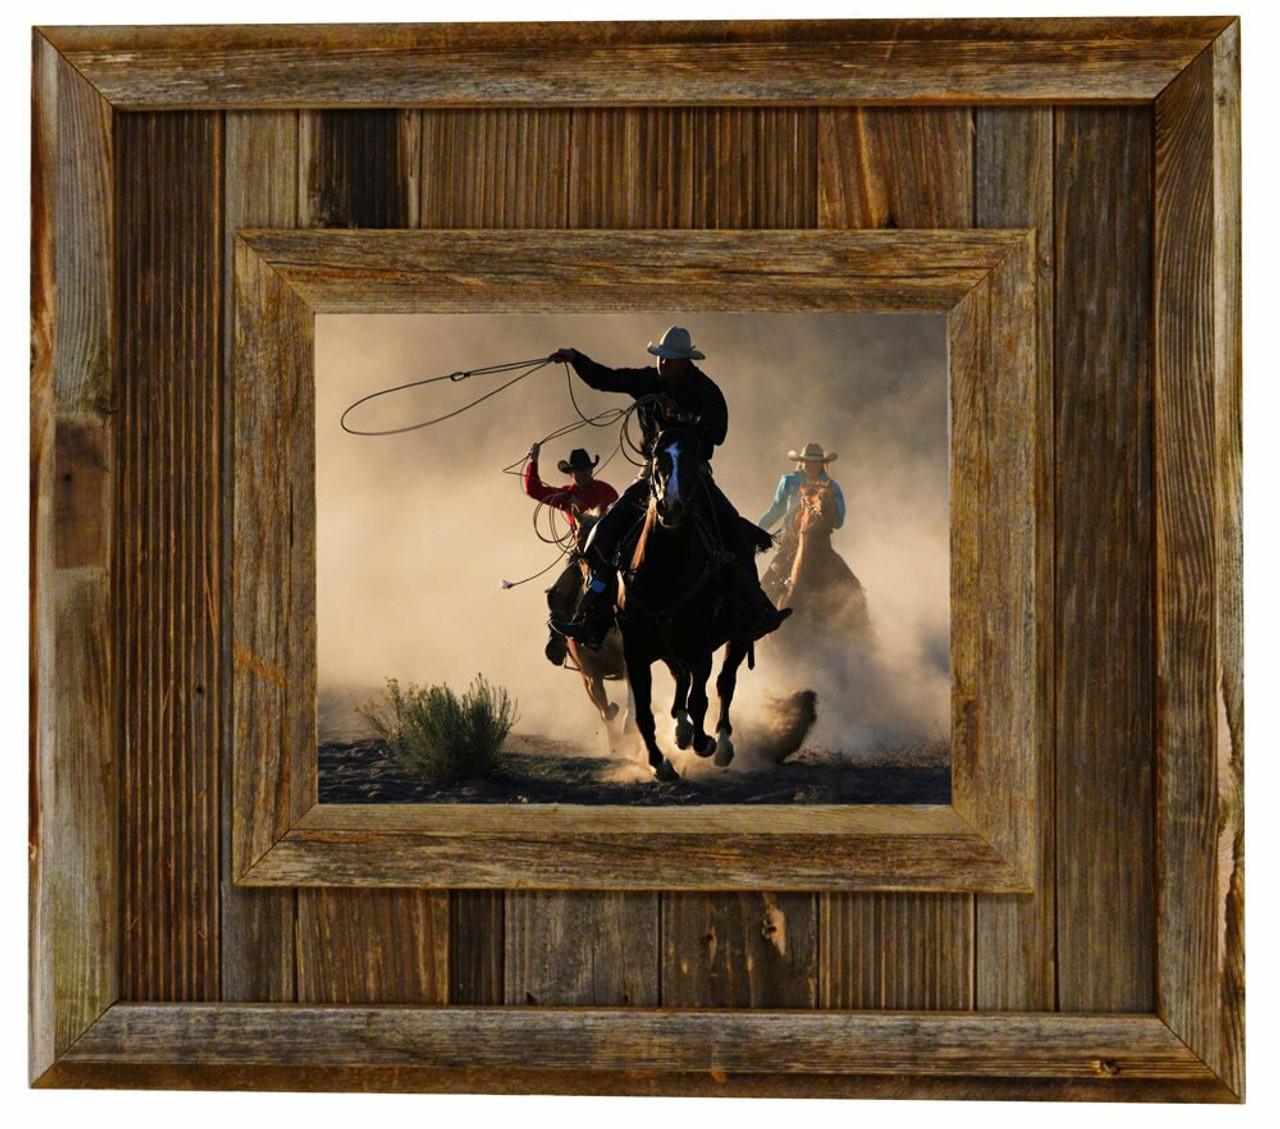 Rustic Barnwood Frame | Durango 18x24 Aged Wood